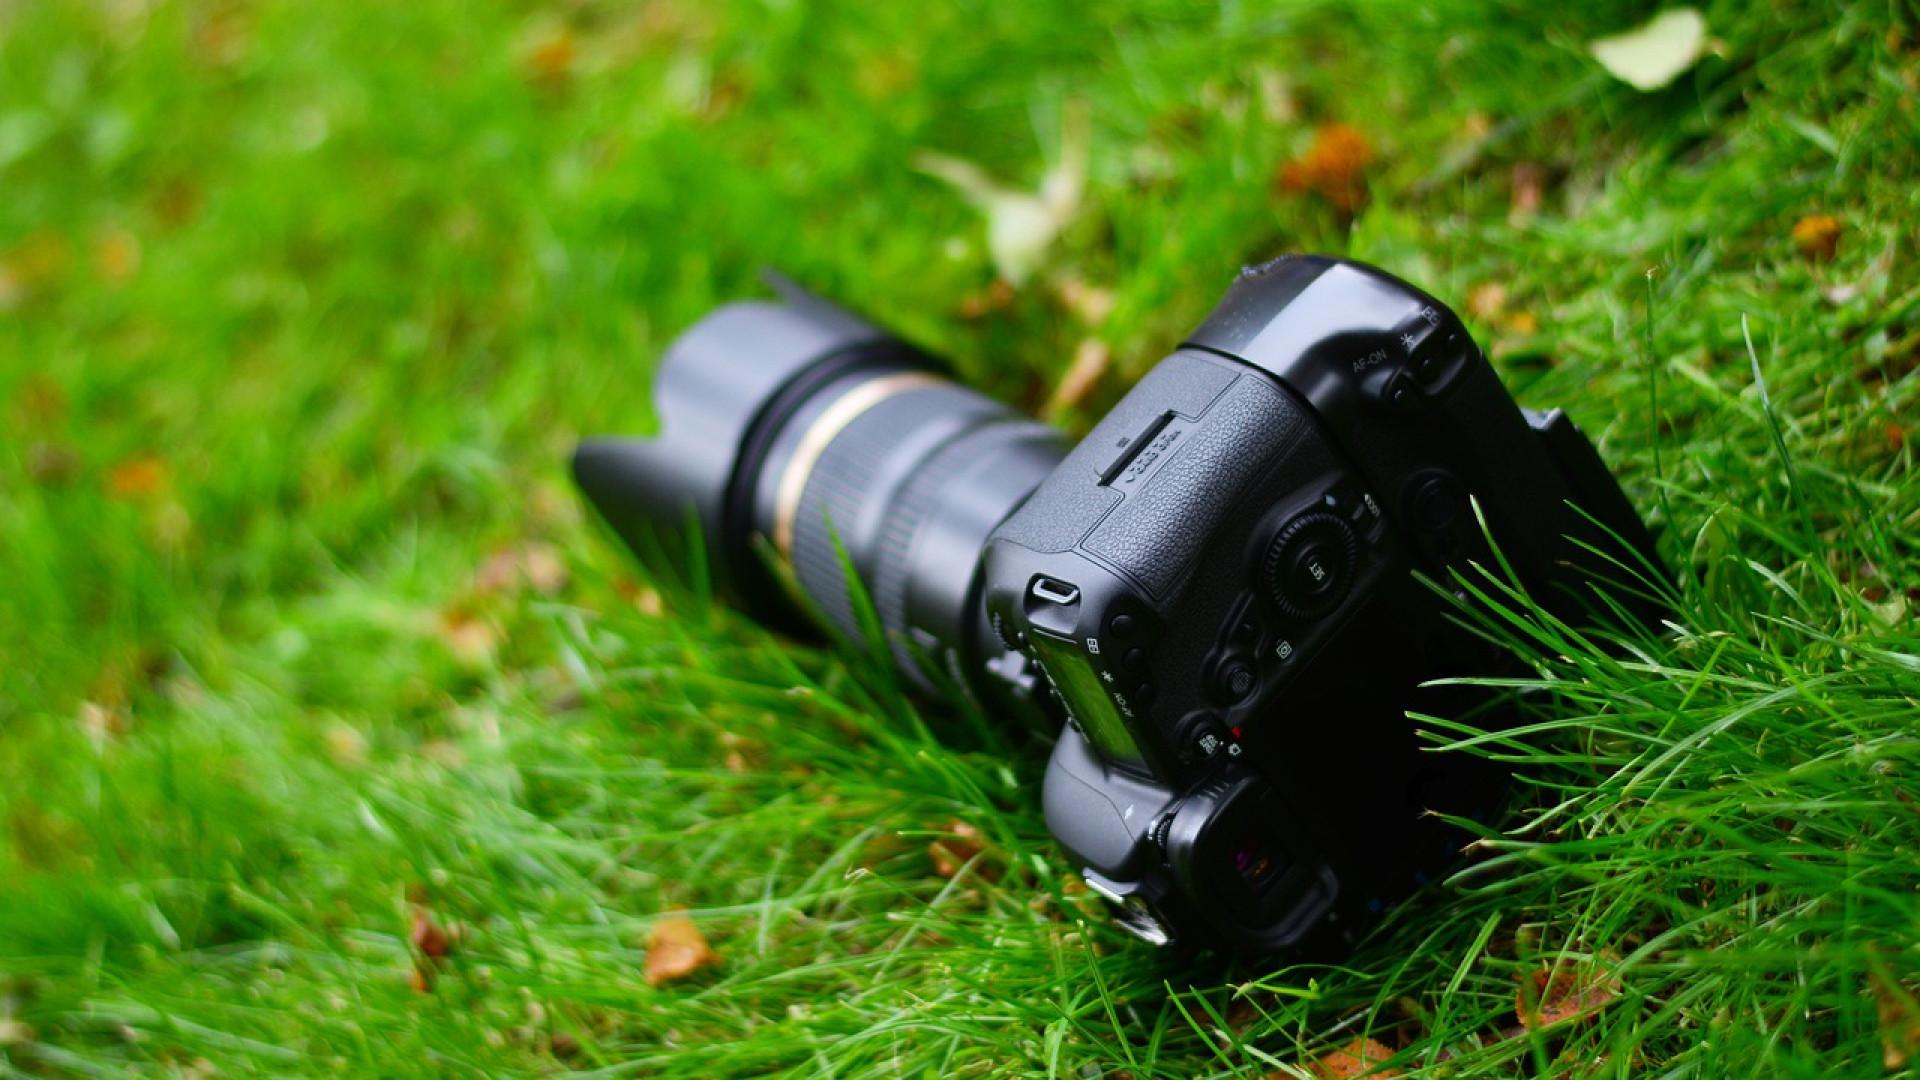 prendre soin de son boitier photo reflex